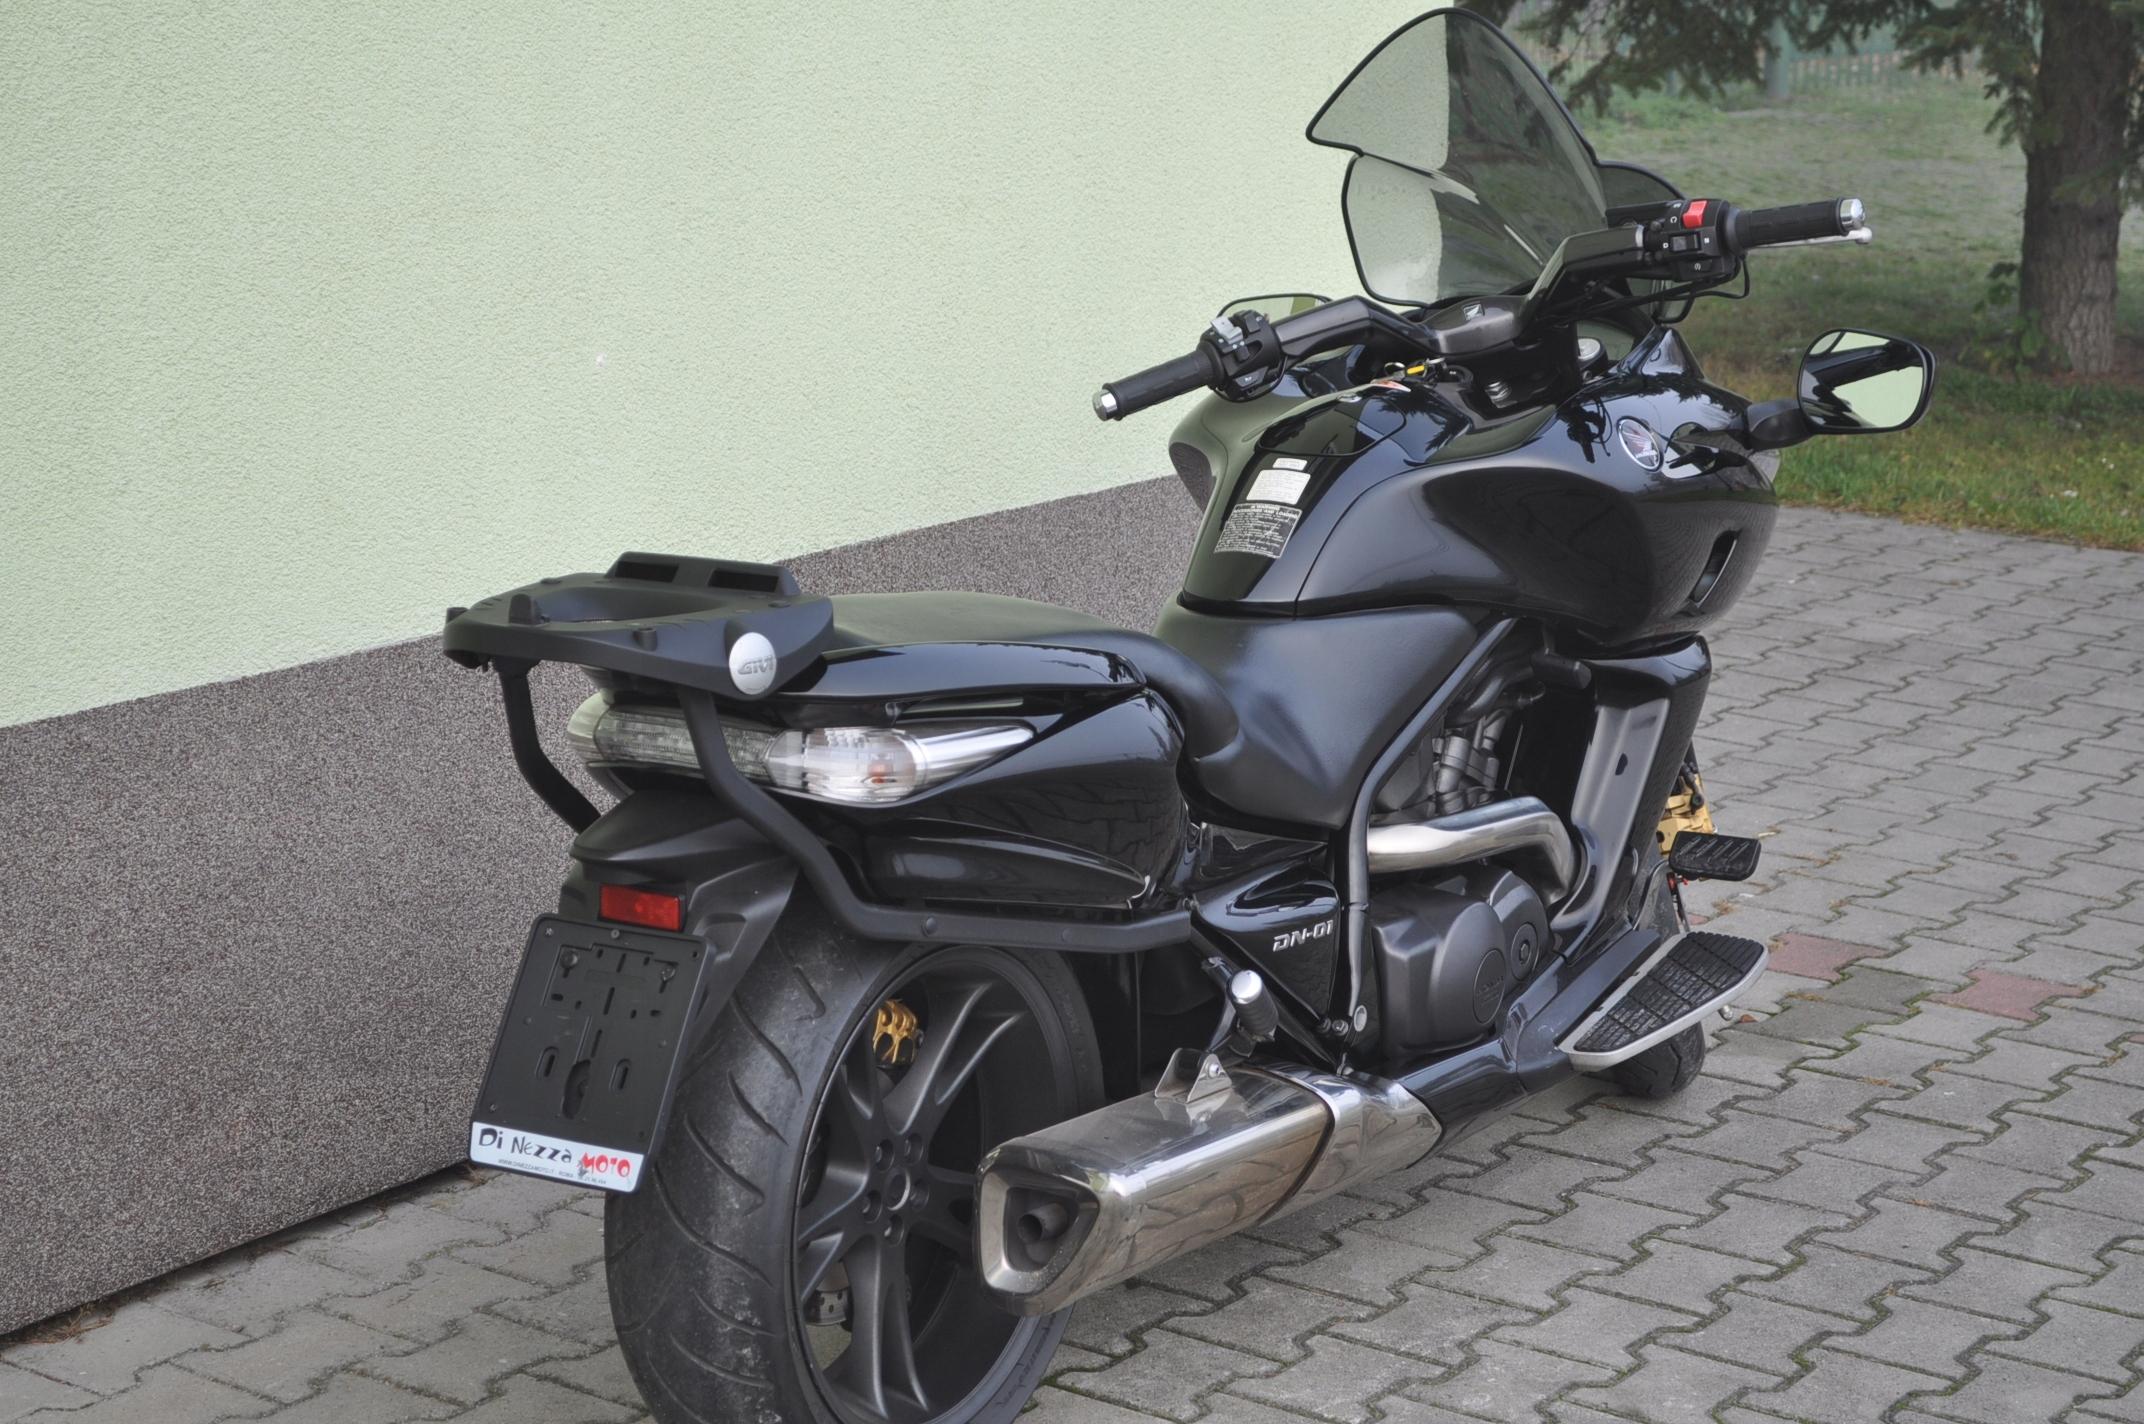 HONDA DN01 DN 01 ABS burgman 650 c 600 tmax 530